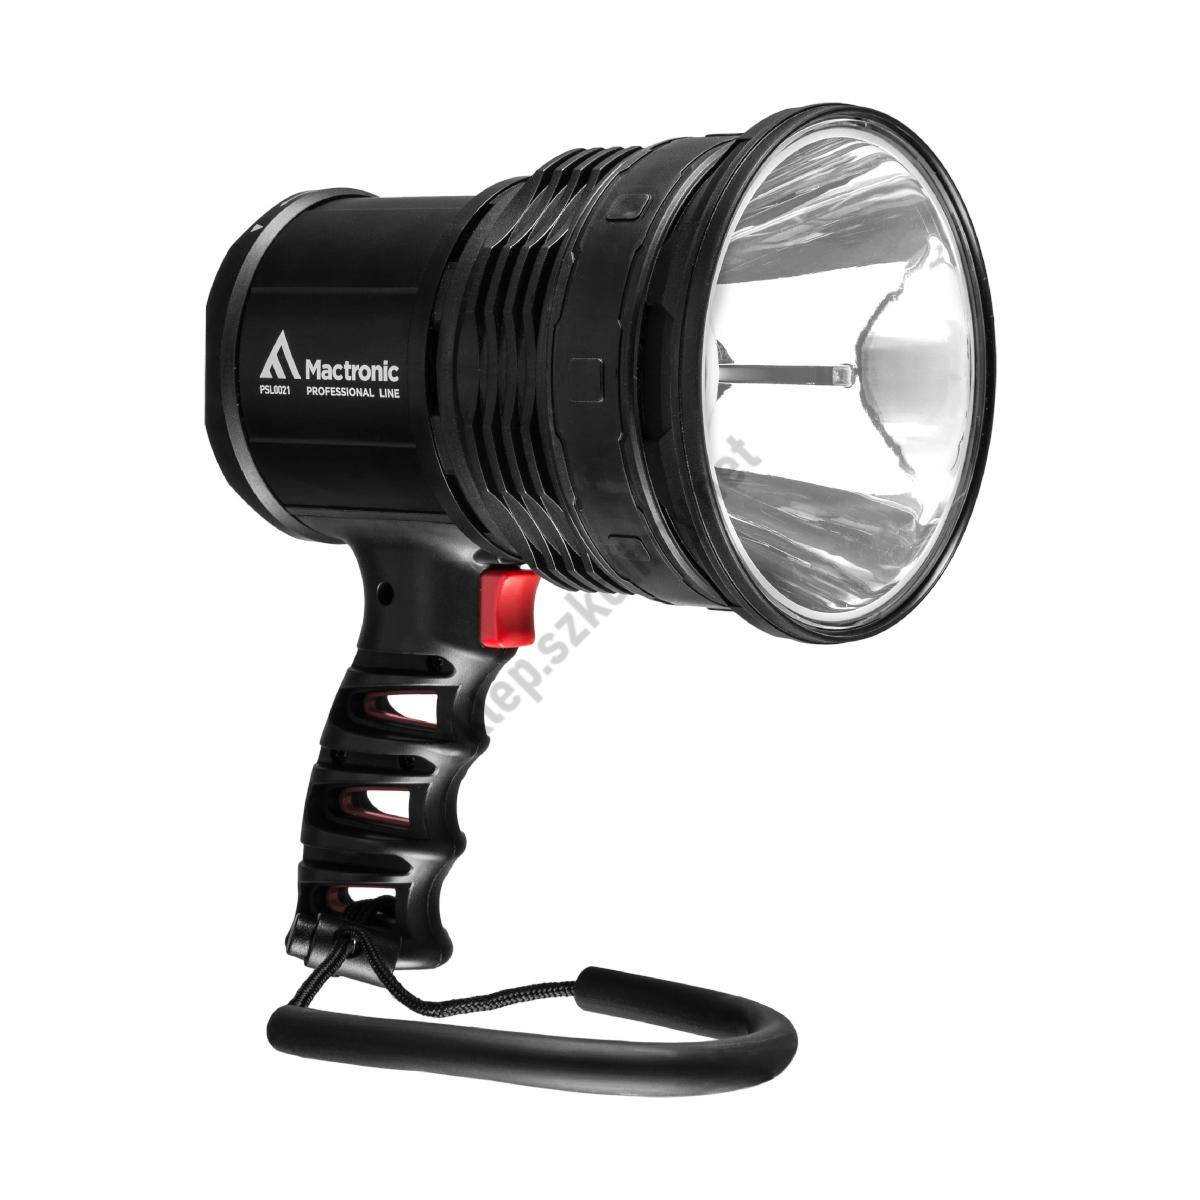 Ładowalny szperacz LED X-Pistol RC 02